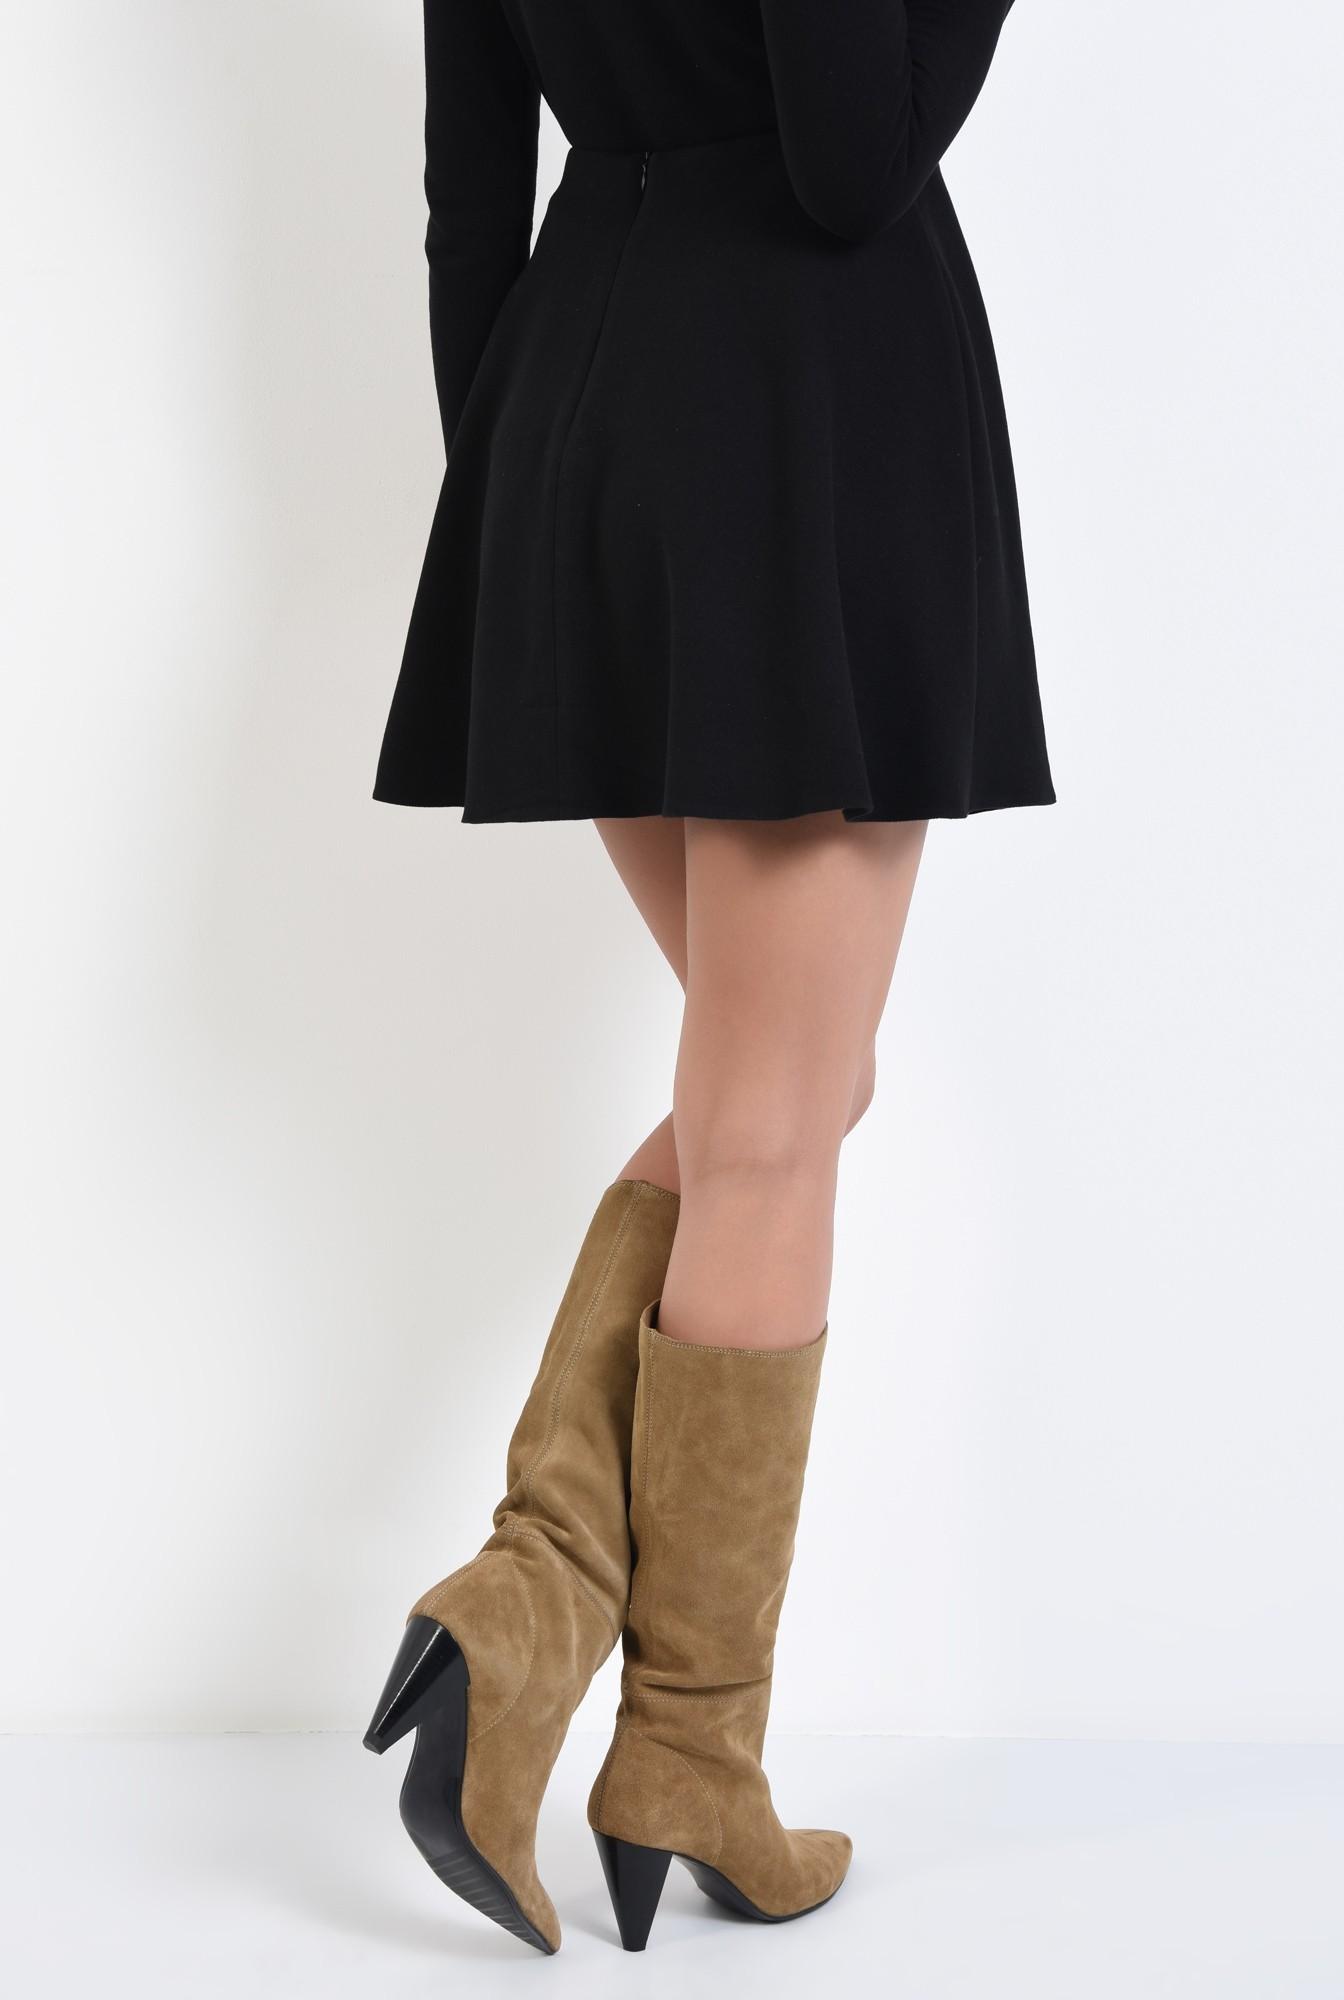 1 - fusta scurta, neagra, tricotata, croi evazat